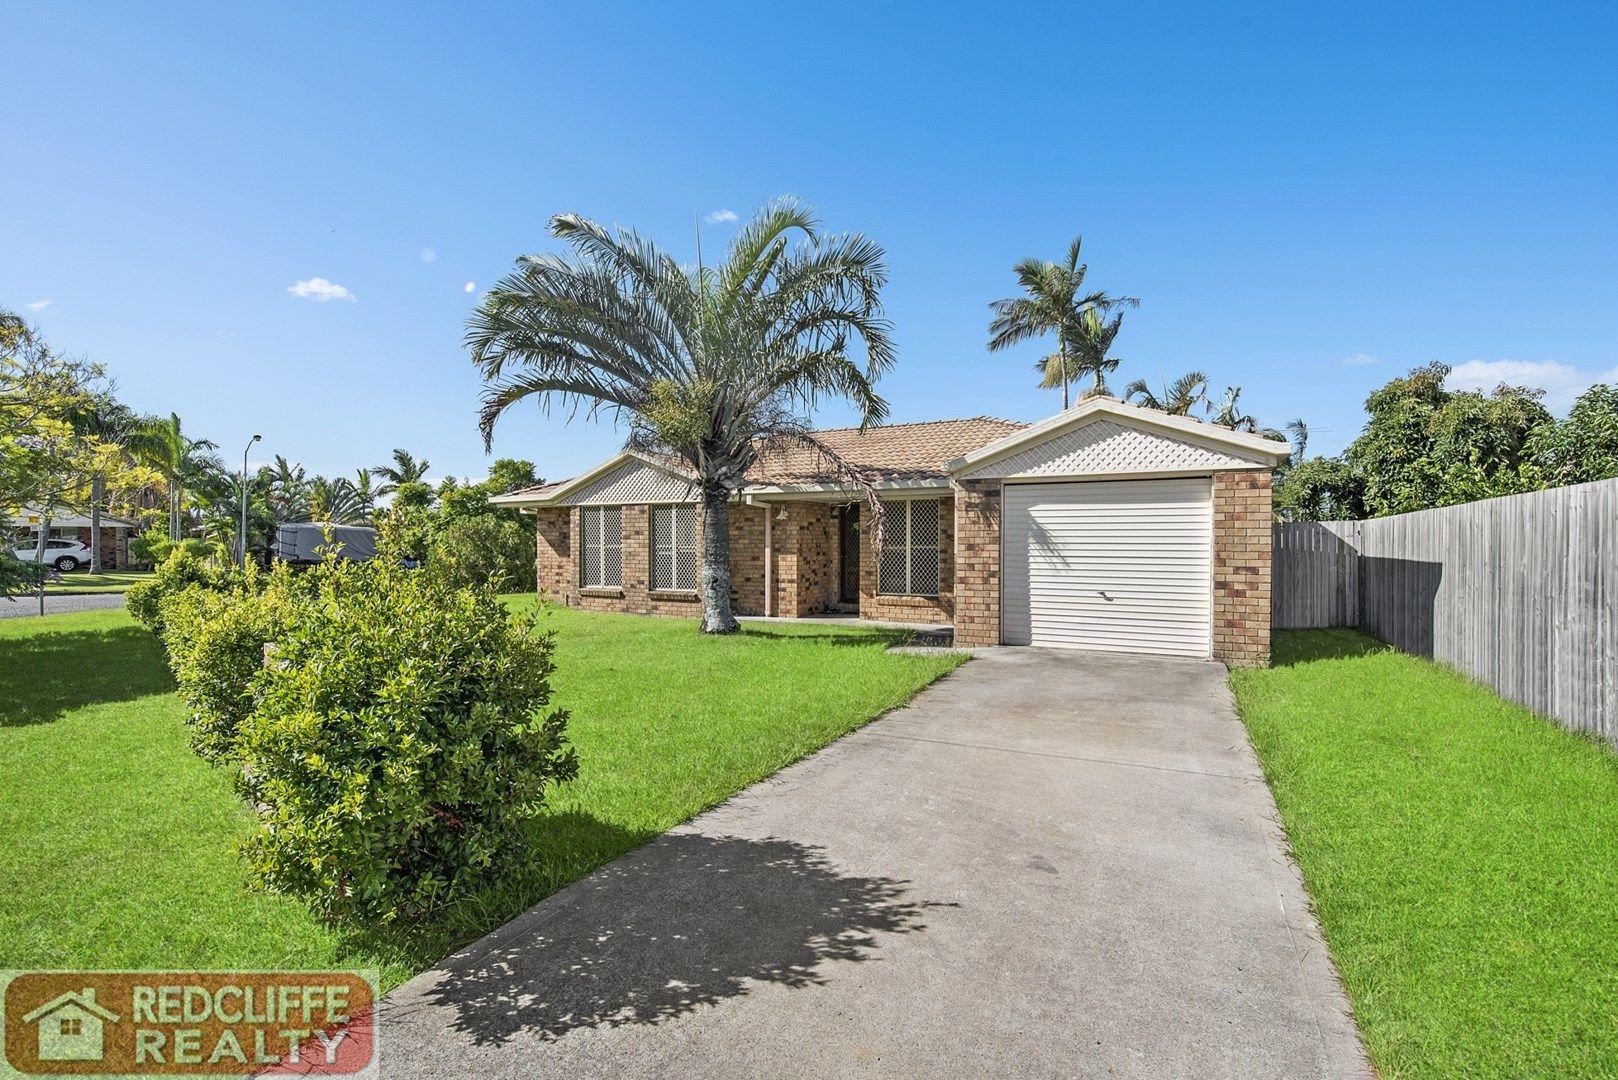 2 Courtney Street, Rothwell QLD 4022, Image 1